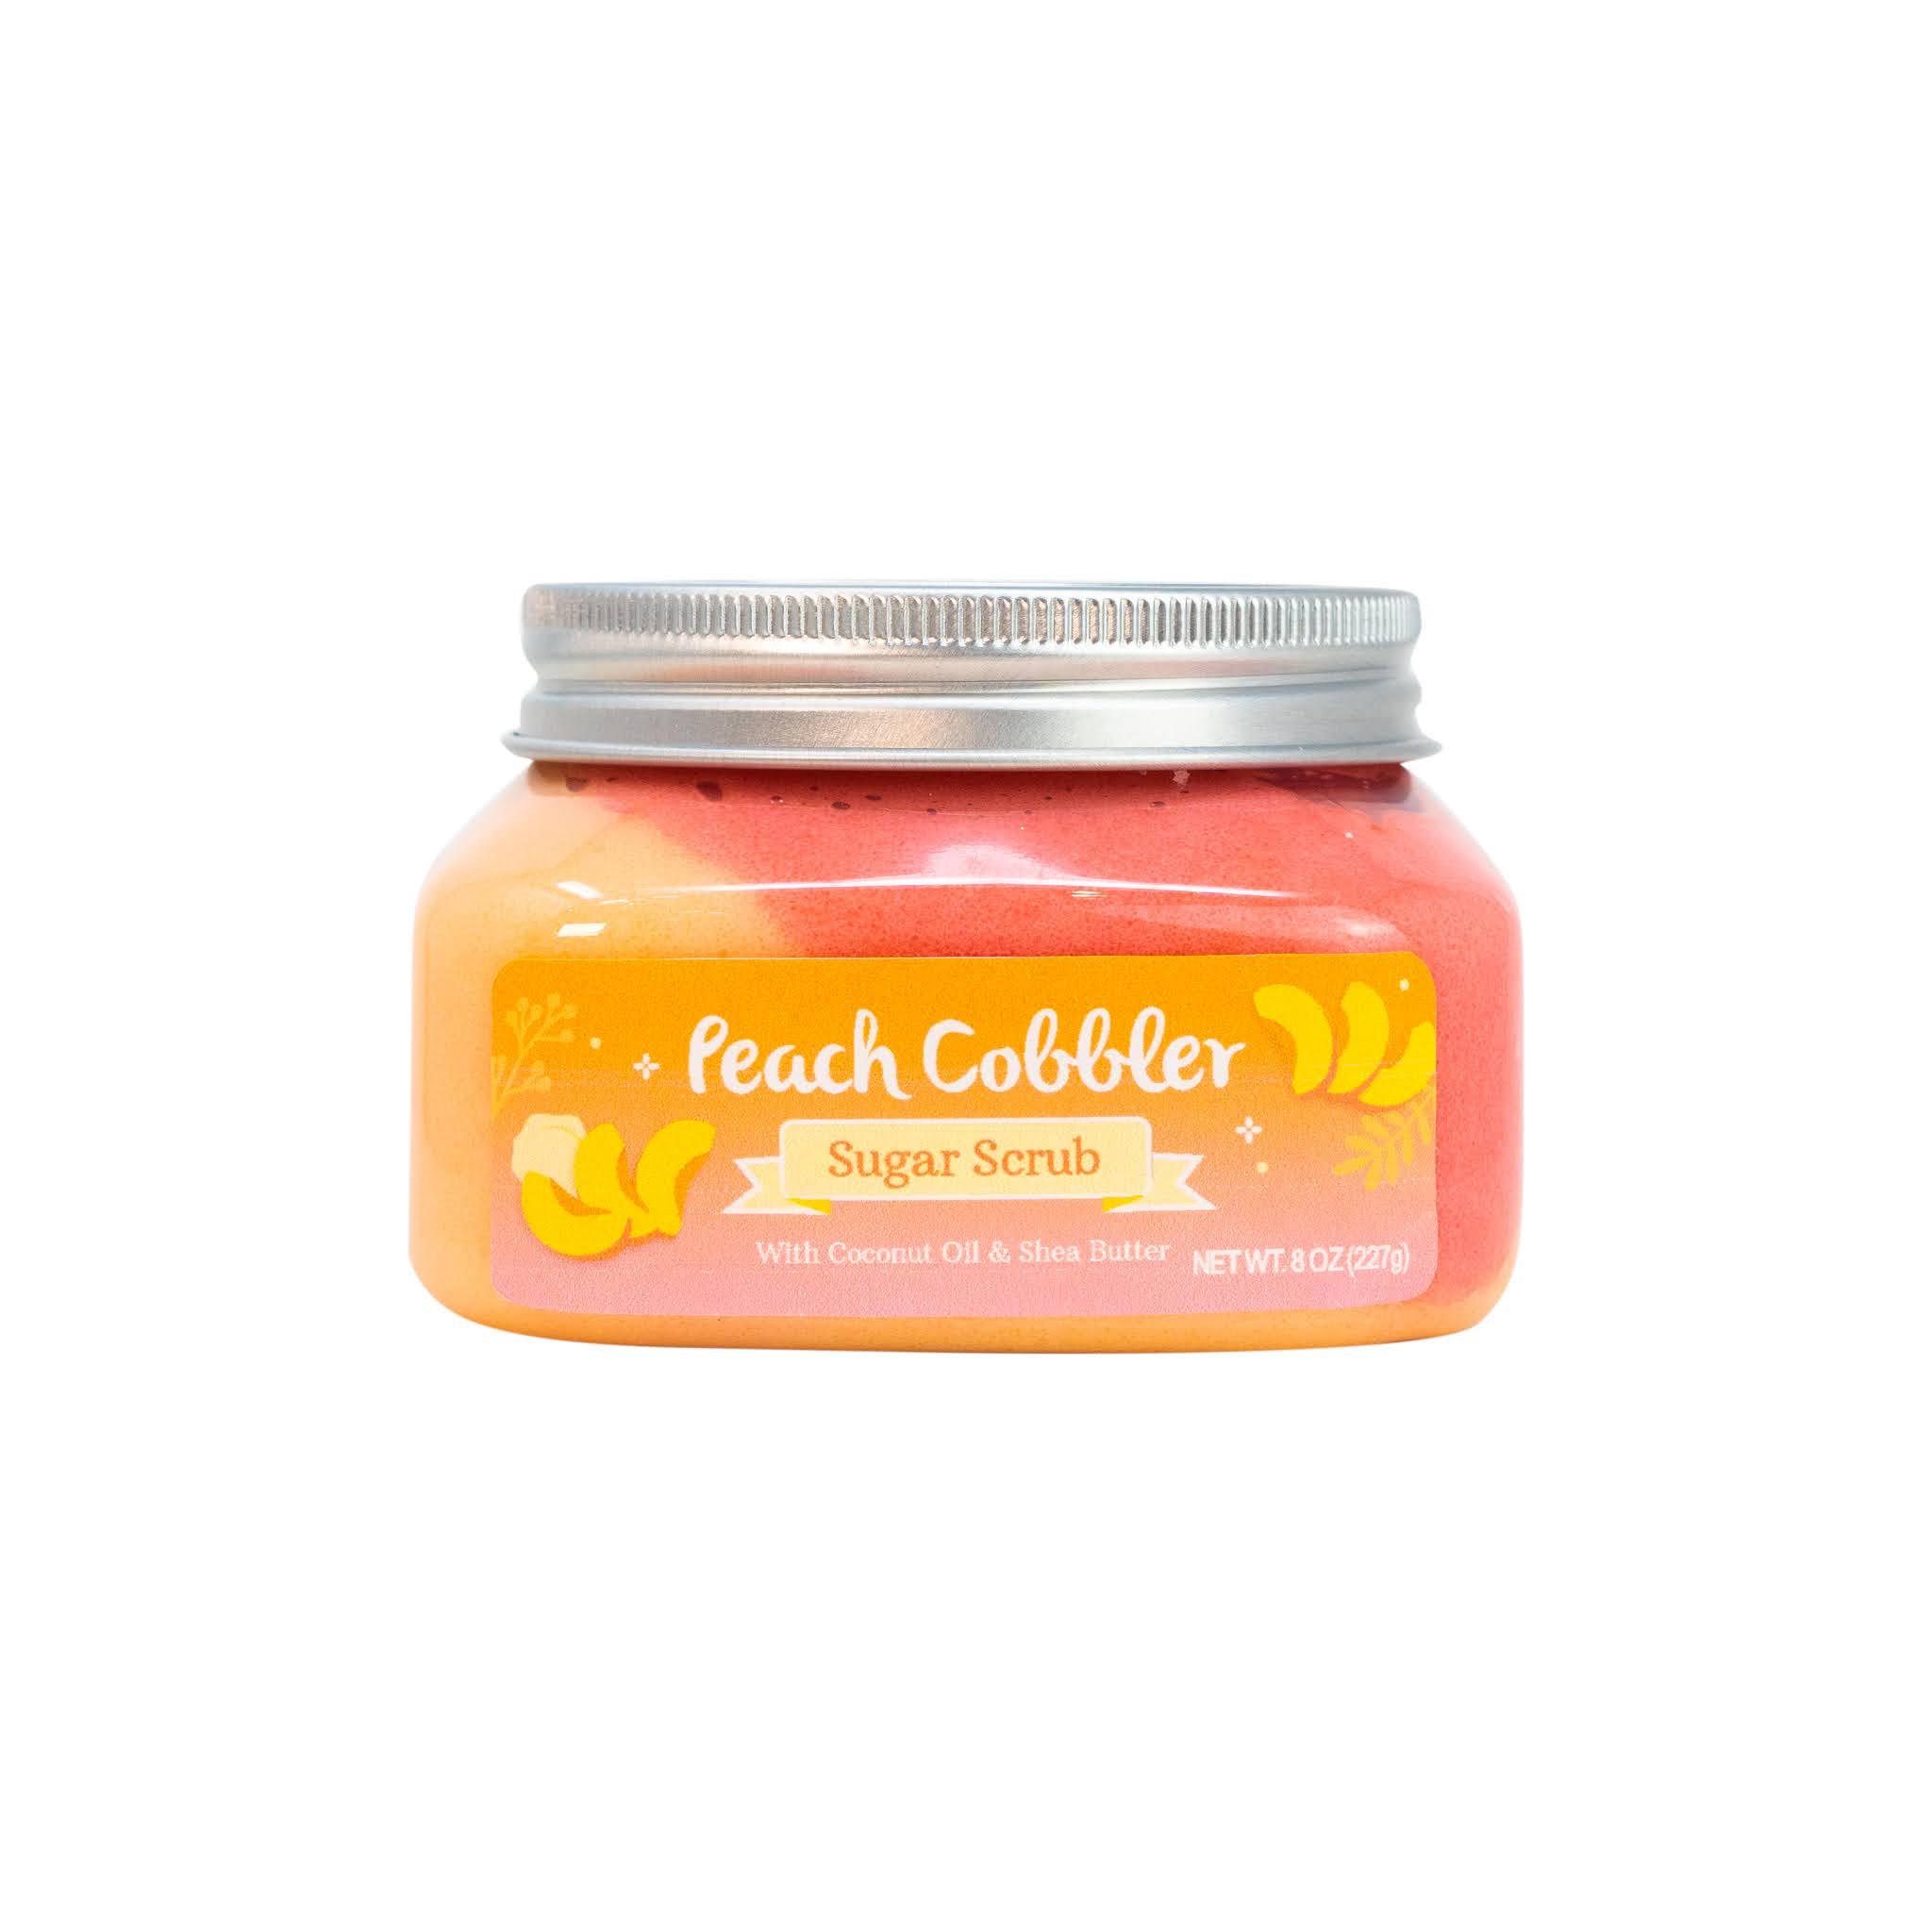 Nectar Bath Treats Peach Cobbler Sugar Body Scrub